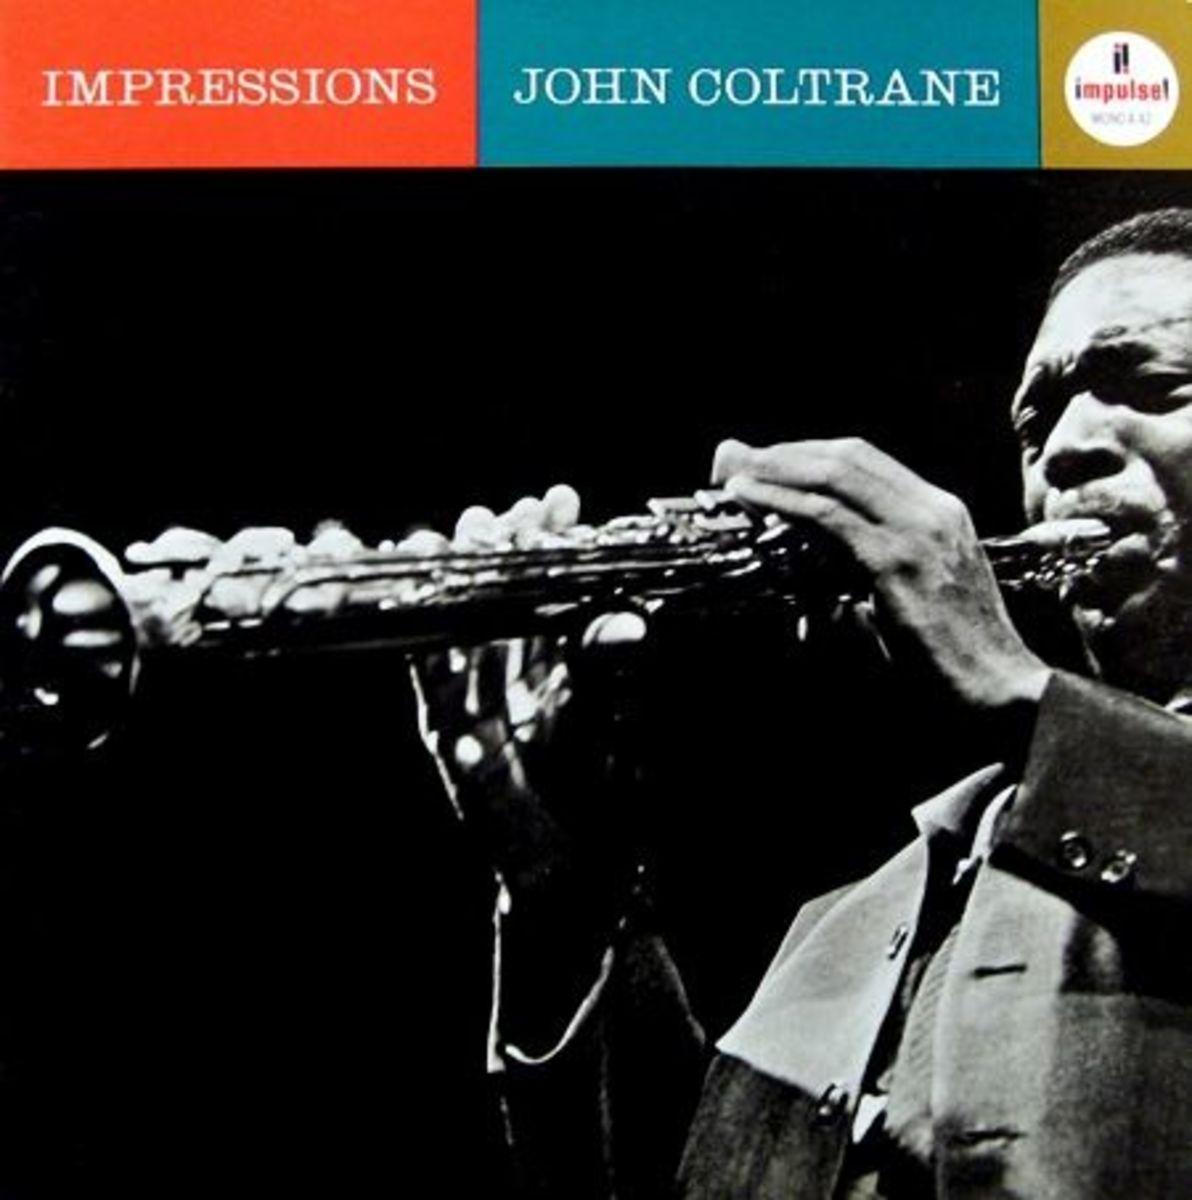 "1963 John Coltrane ""Impressions""  Impulse Records A-42 12"" LP Vinyl Record (1963) Album Cover Design by Robert Flynn, Photo by Joe Alper"